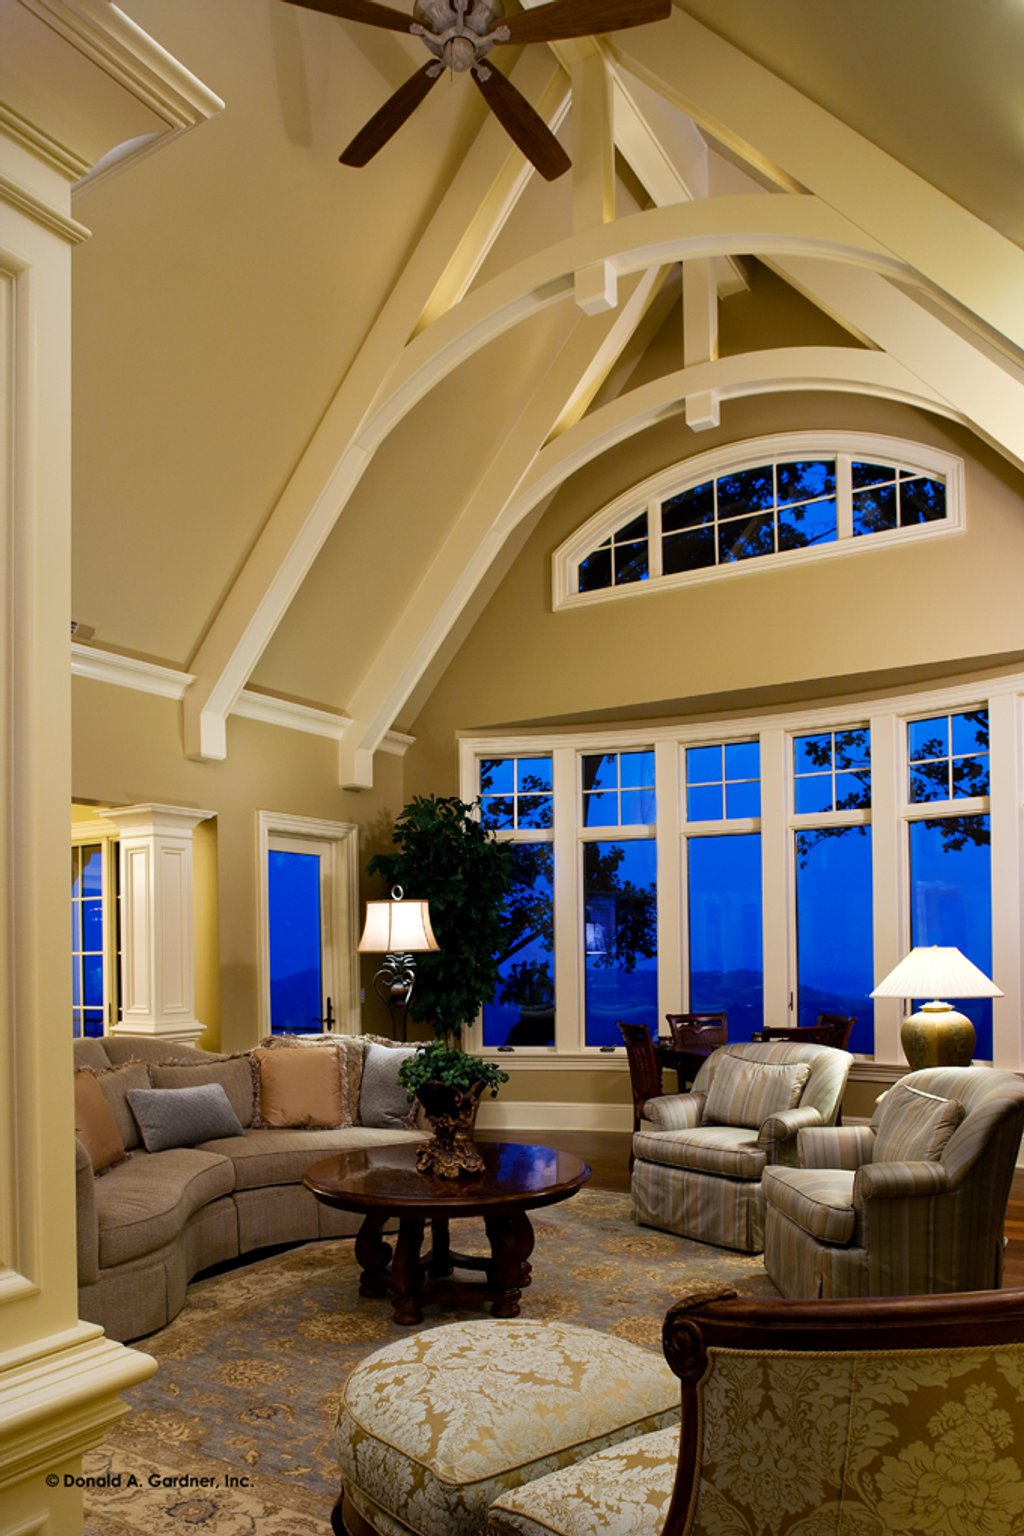 Living Room Interior Design Pdf: 4 Beds 4.5 Baths 4547 Sq/Ft